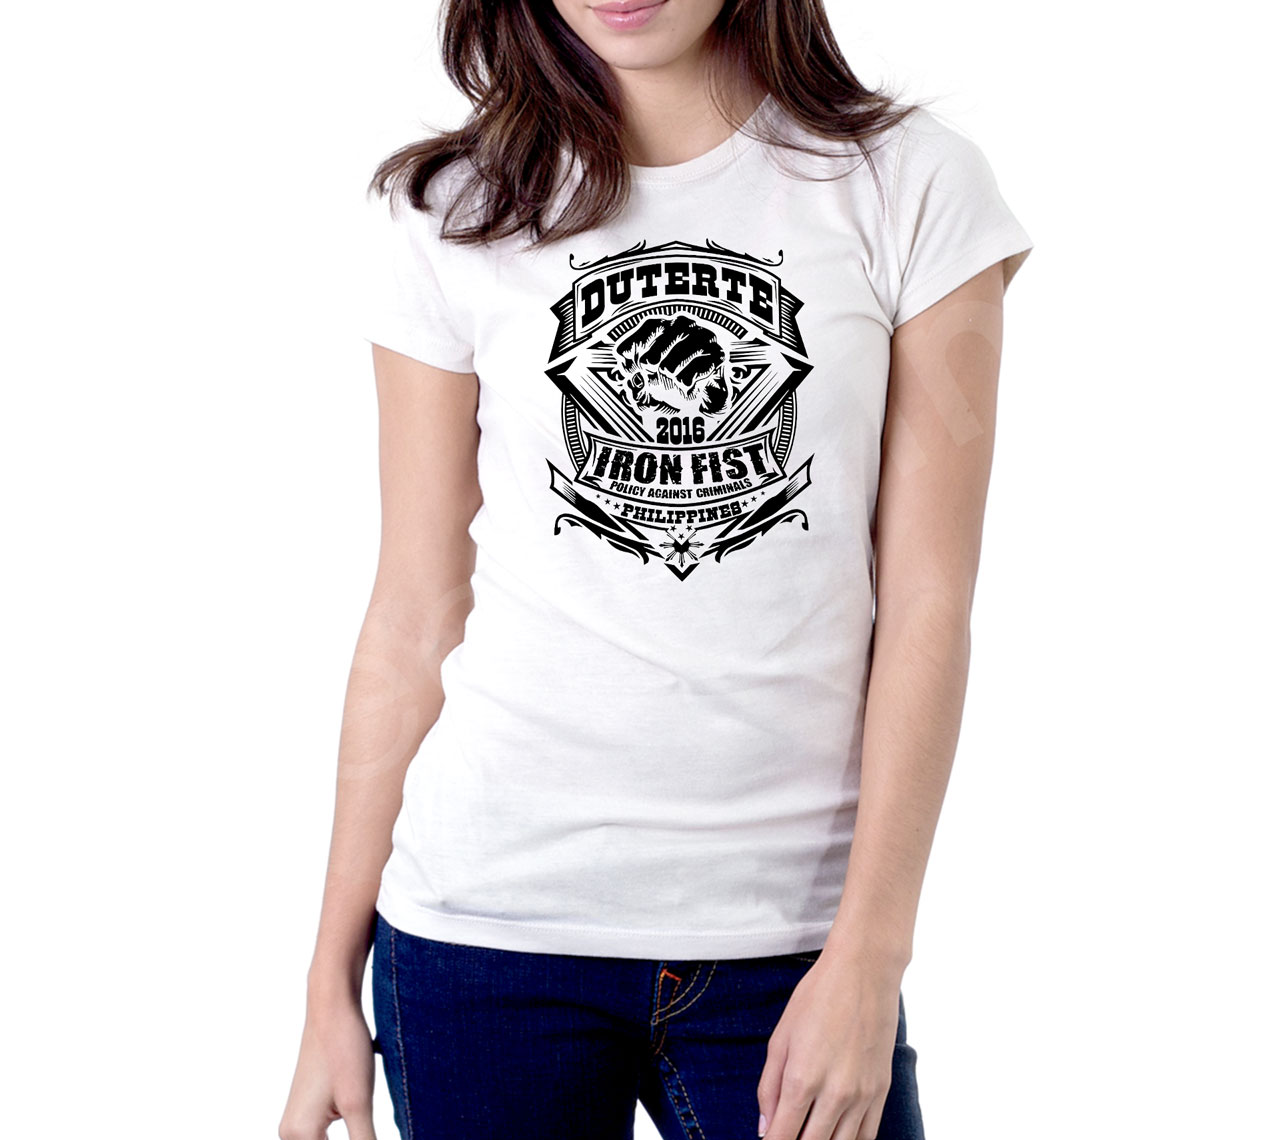 Shirt design ladies - Rodrigo Rody Roa Duterte President Of The Republic Of The Philippines Design Inspired T Shirt